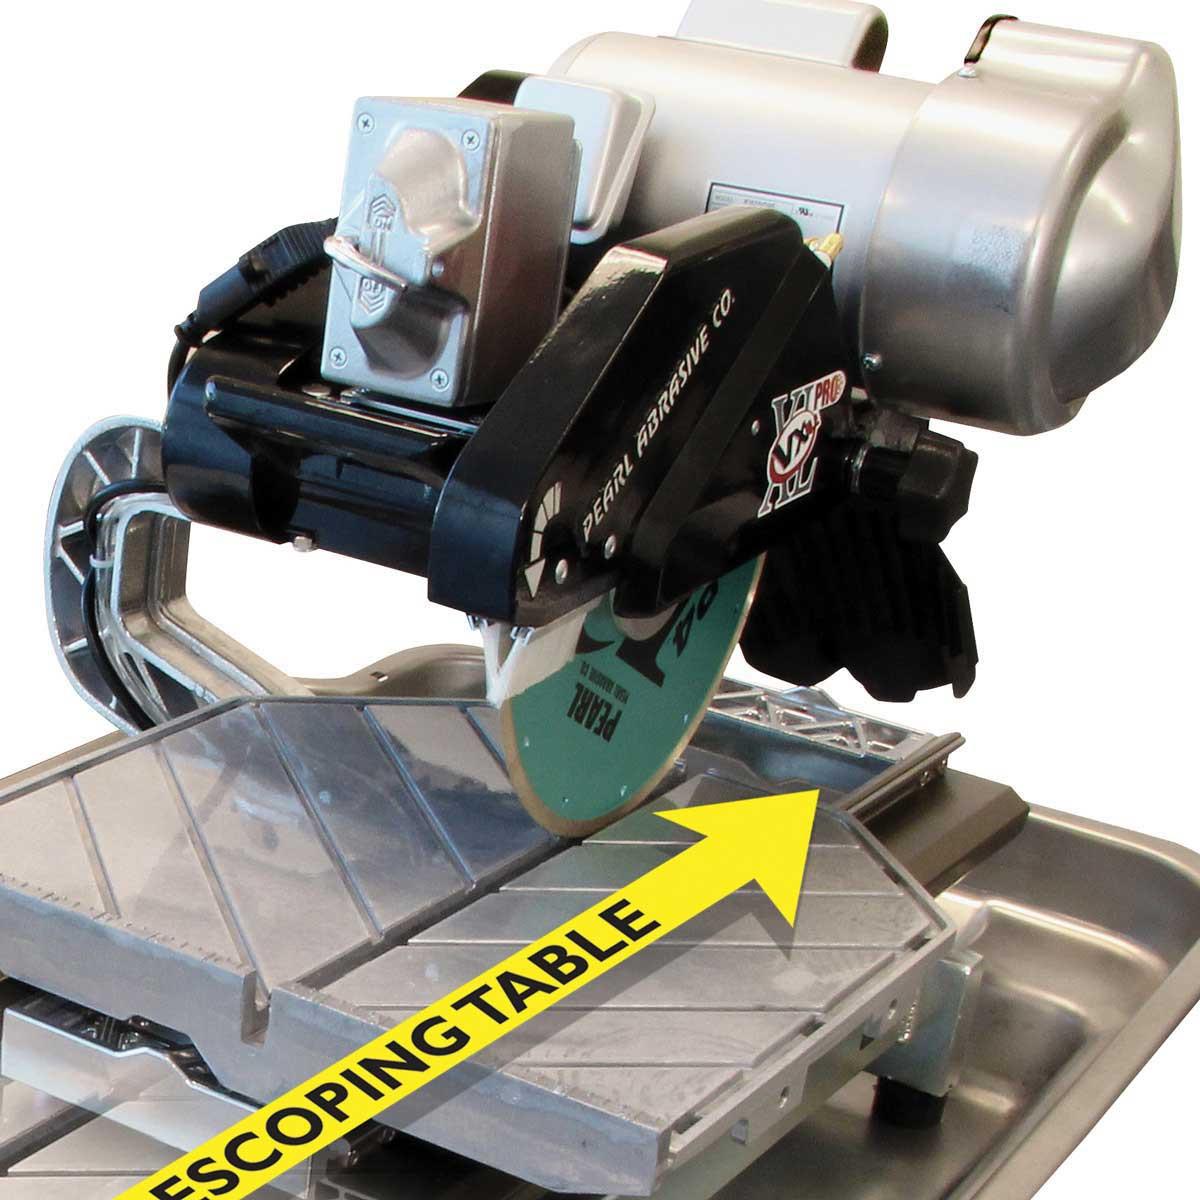 Pearl Abrasive Professional Tile Saw Direct Drive Motor